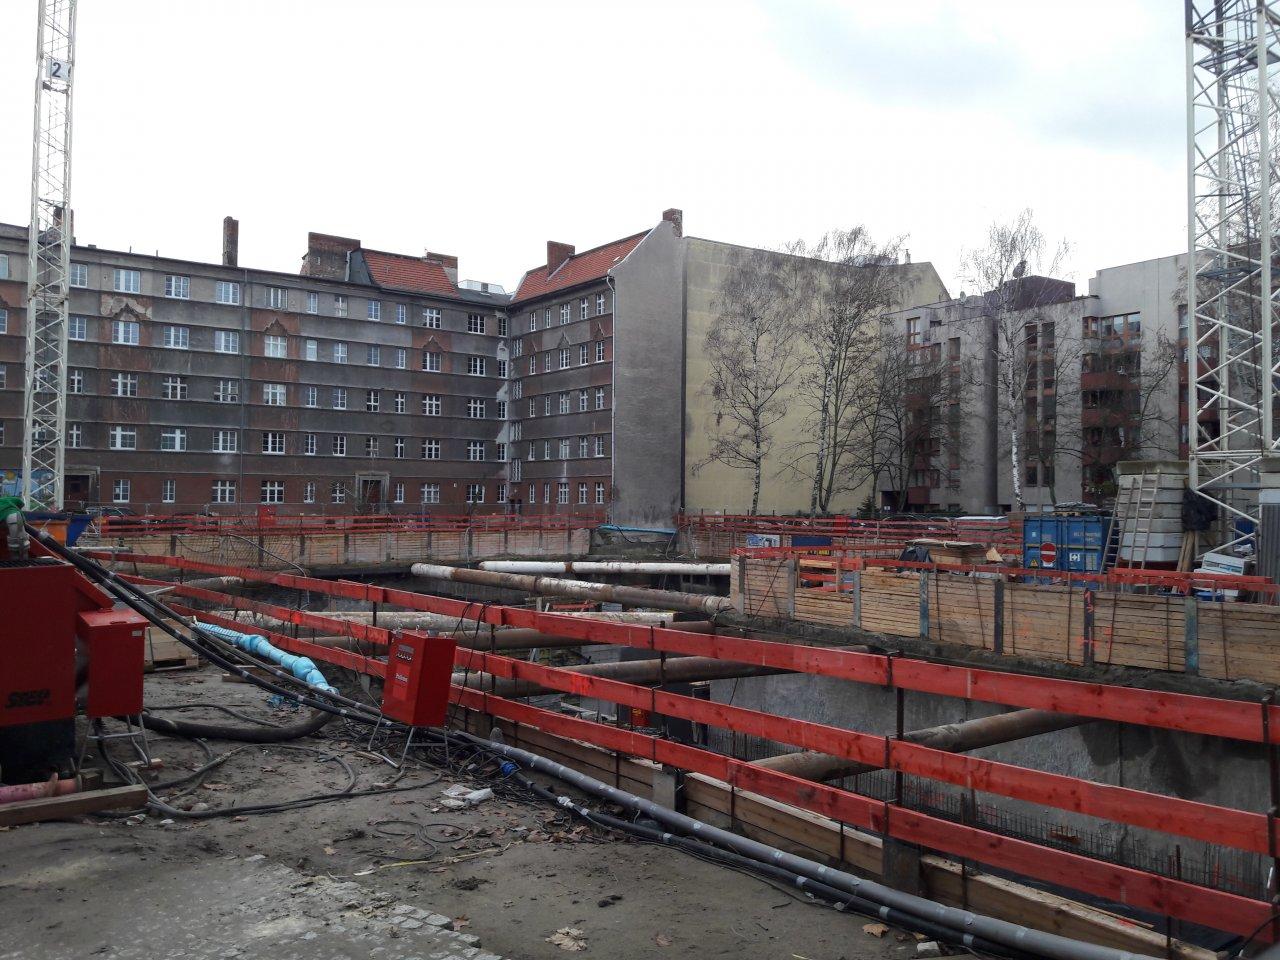 Alexander-Berlin-Ralf-Schmitz-Tiefbau.jpg